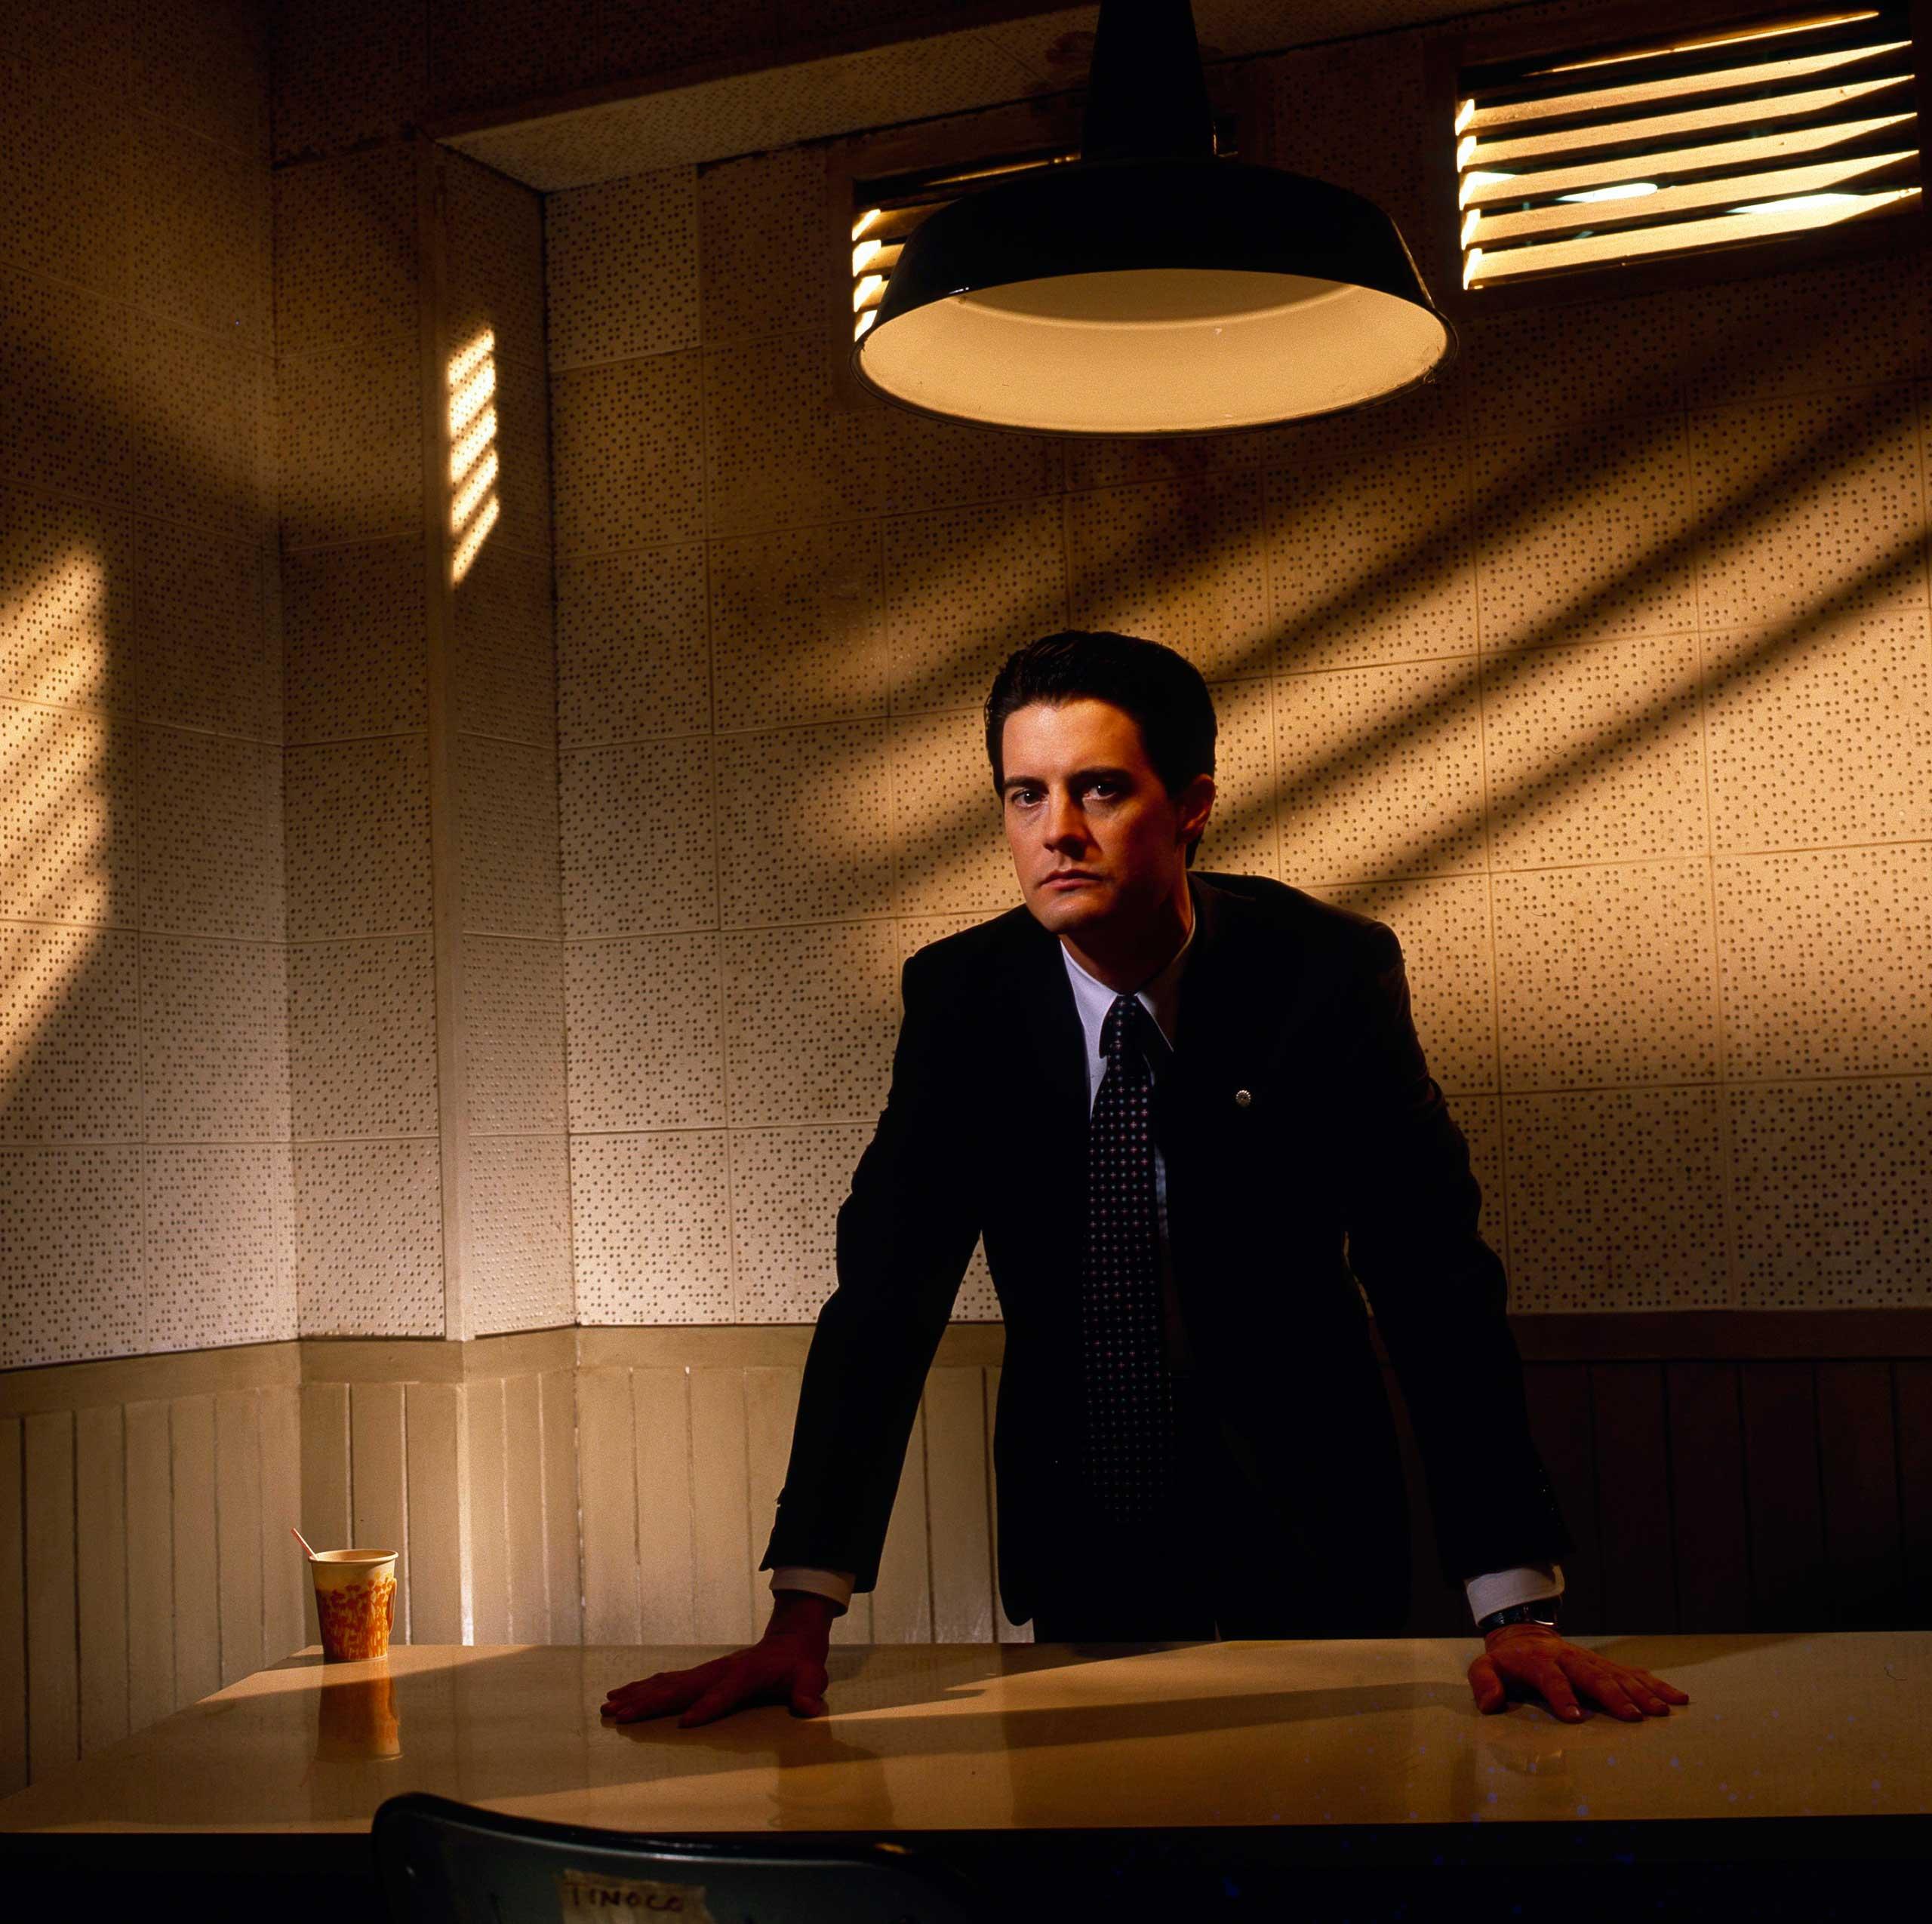 Kyle MacLachlan, 1990.